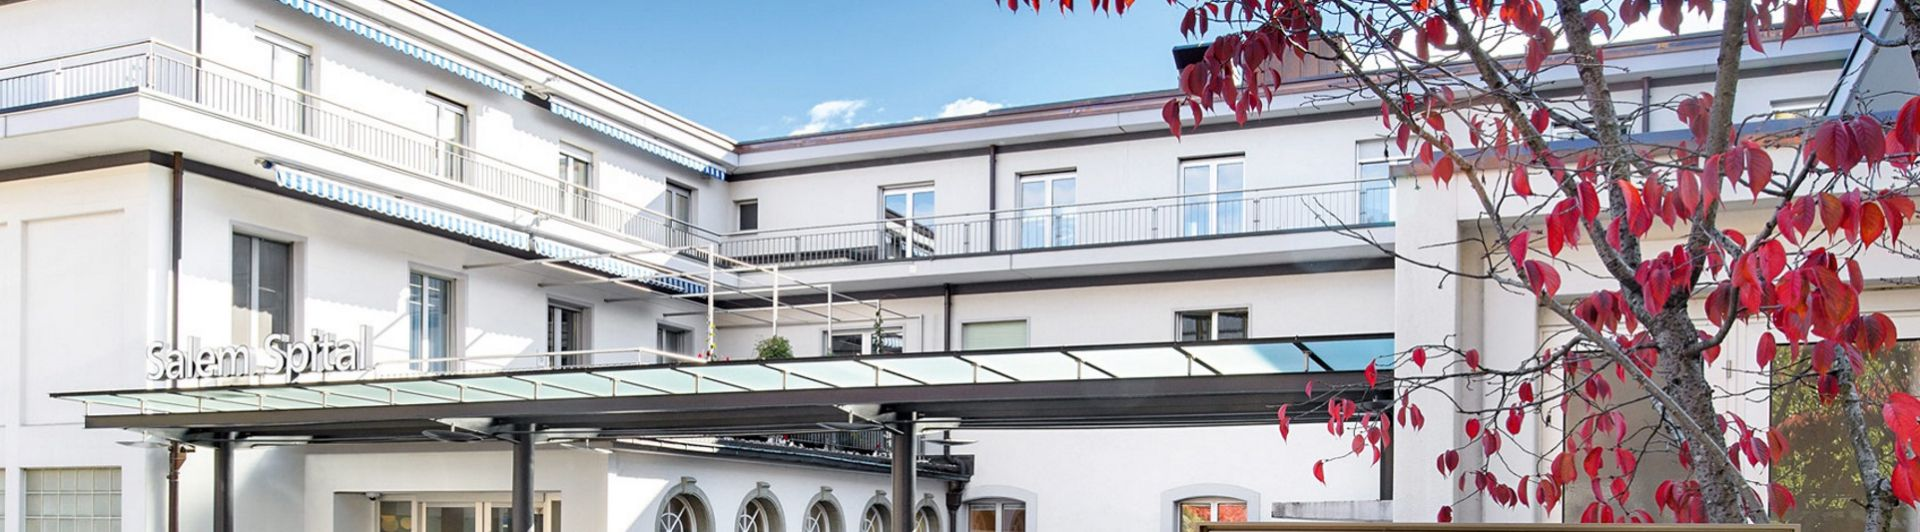 Hirslanden Salem-Spital, Bern